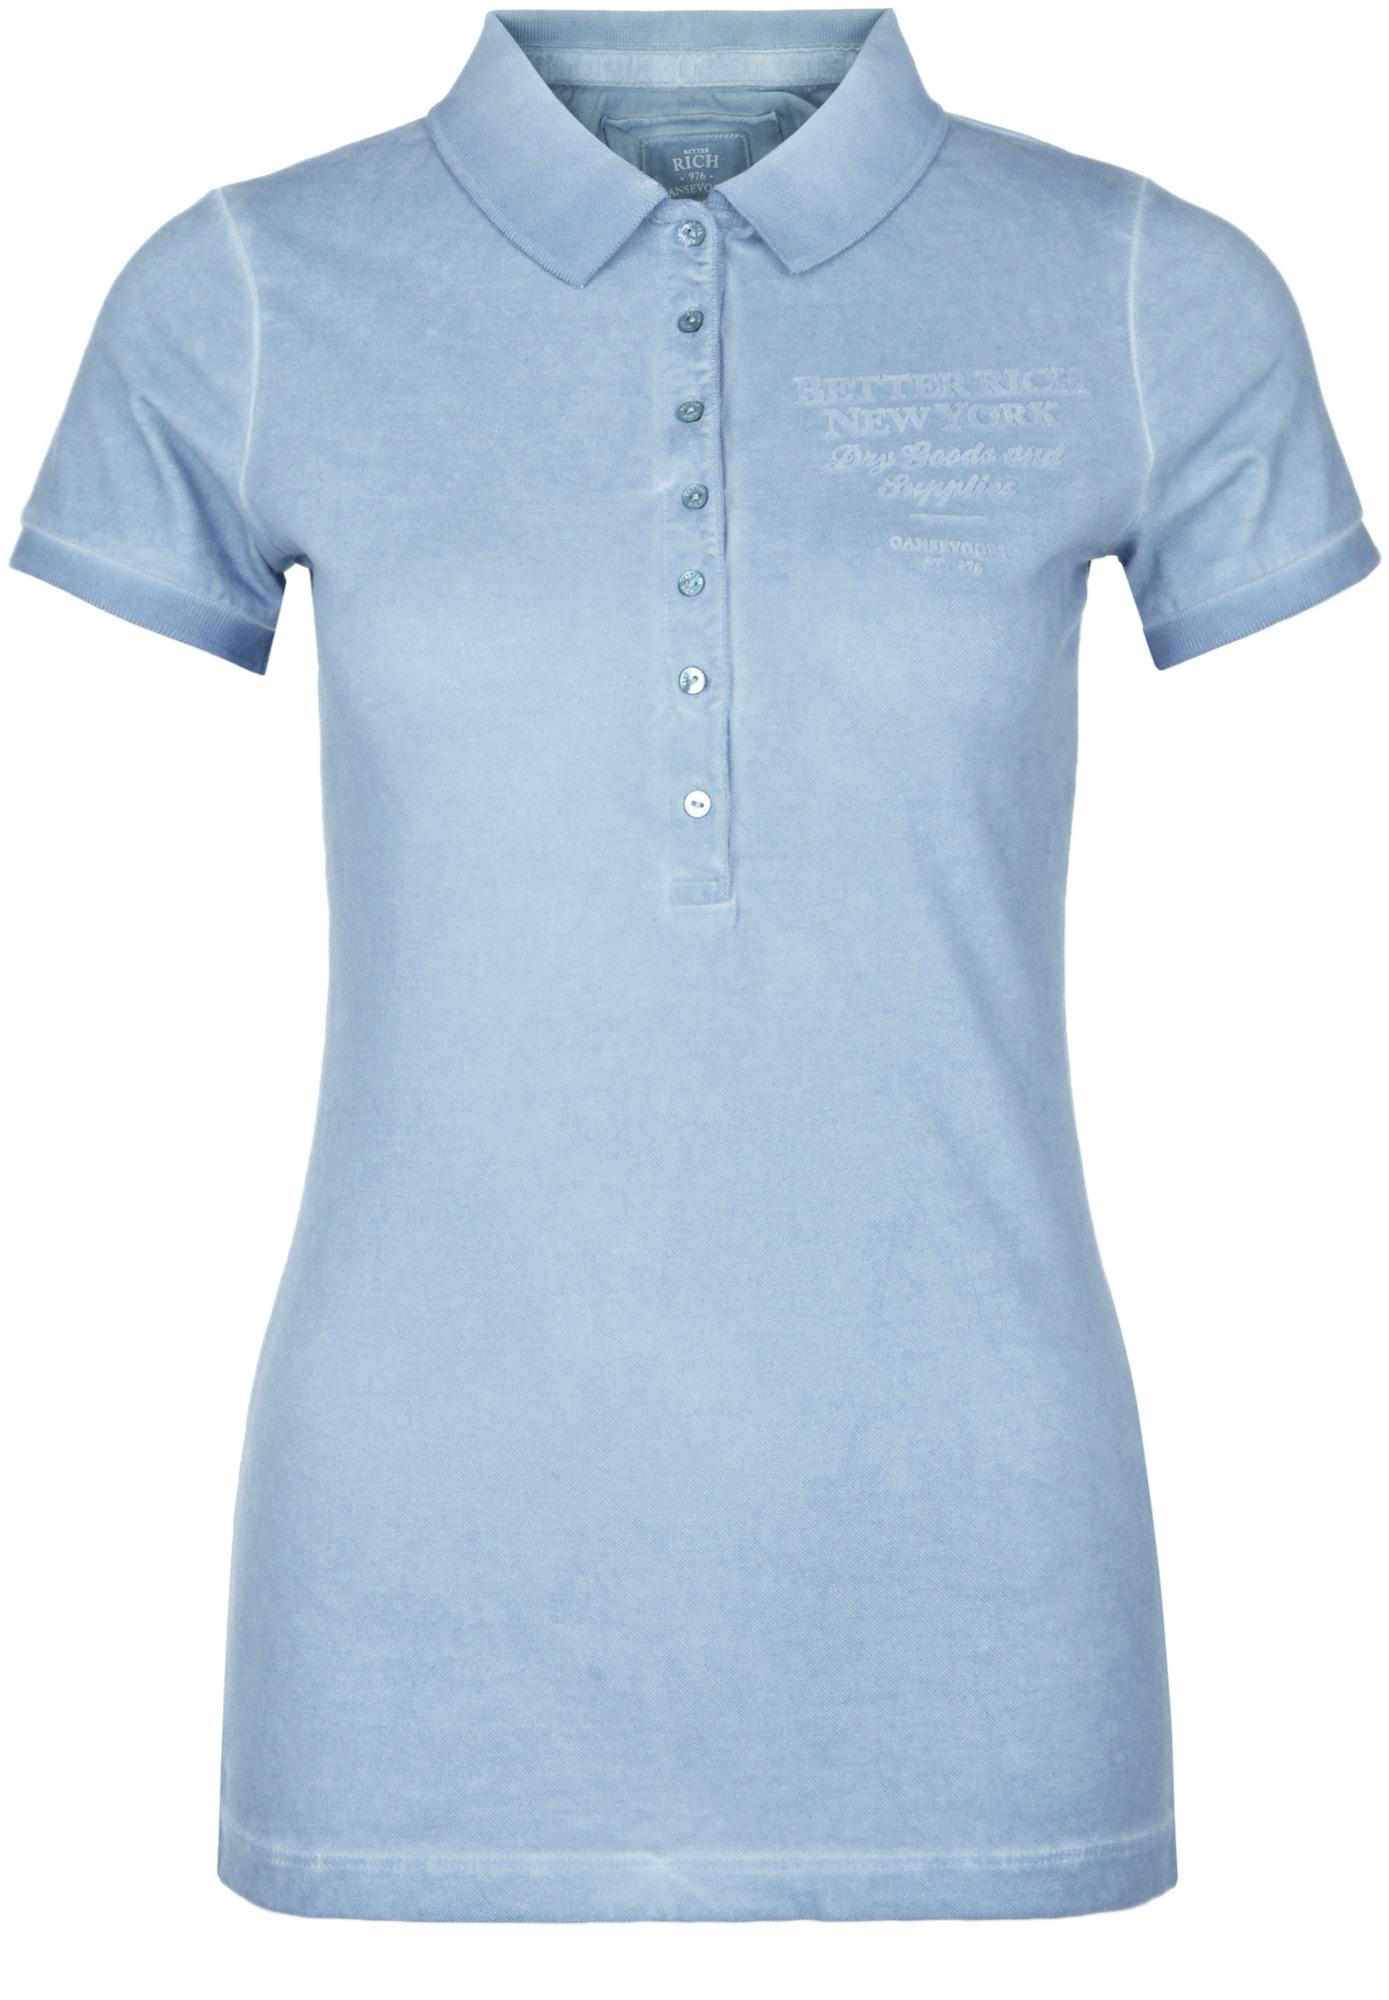 Poloshirt 'Polo paillette' | Bekleidung > Shirts > Poloshirts | BETTER RICH